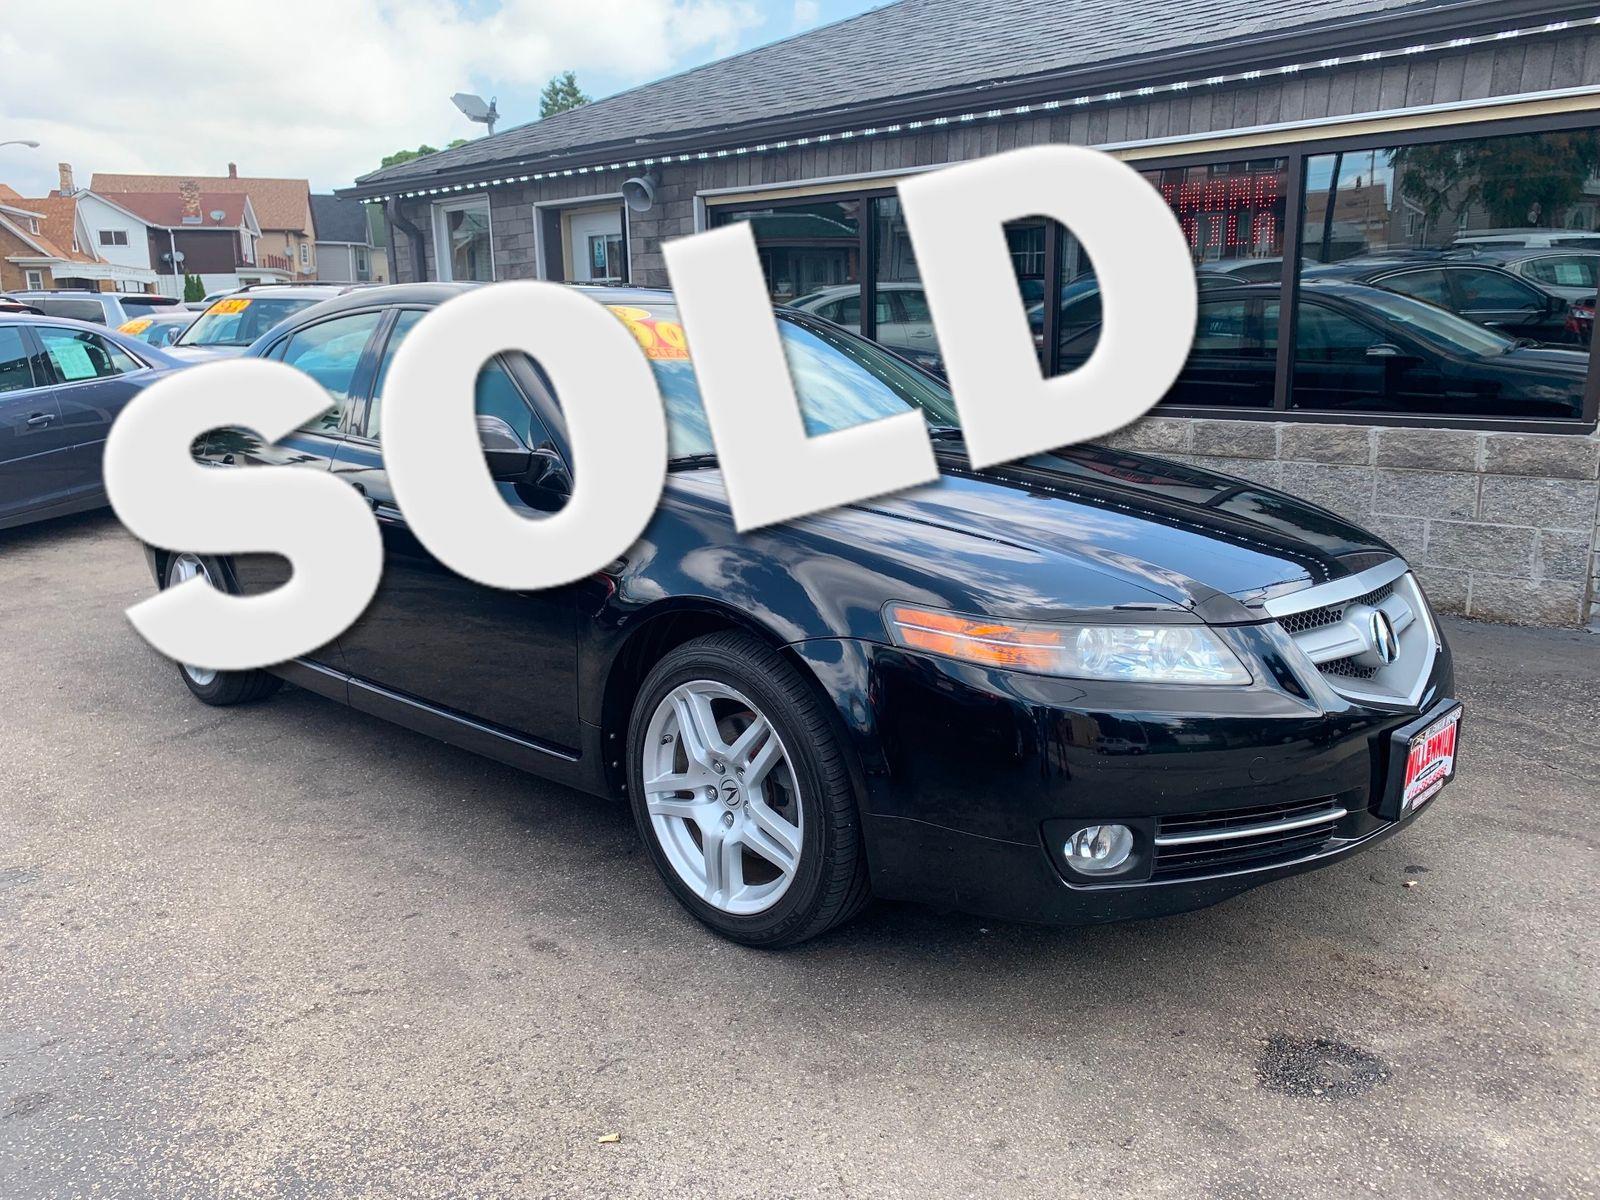 2008 Acura Tl For Sale >> 2008 Acura Tl Base City Wisconsin Millennium Motor Sales